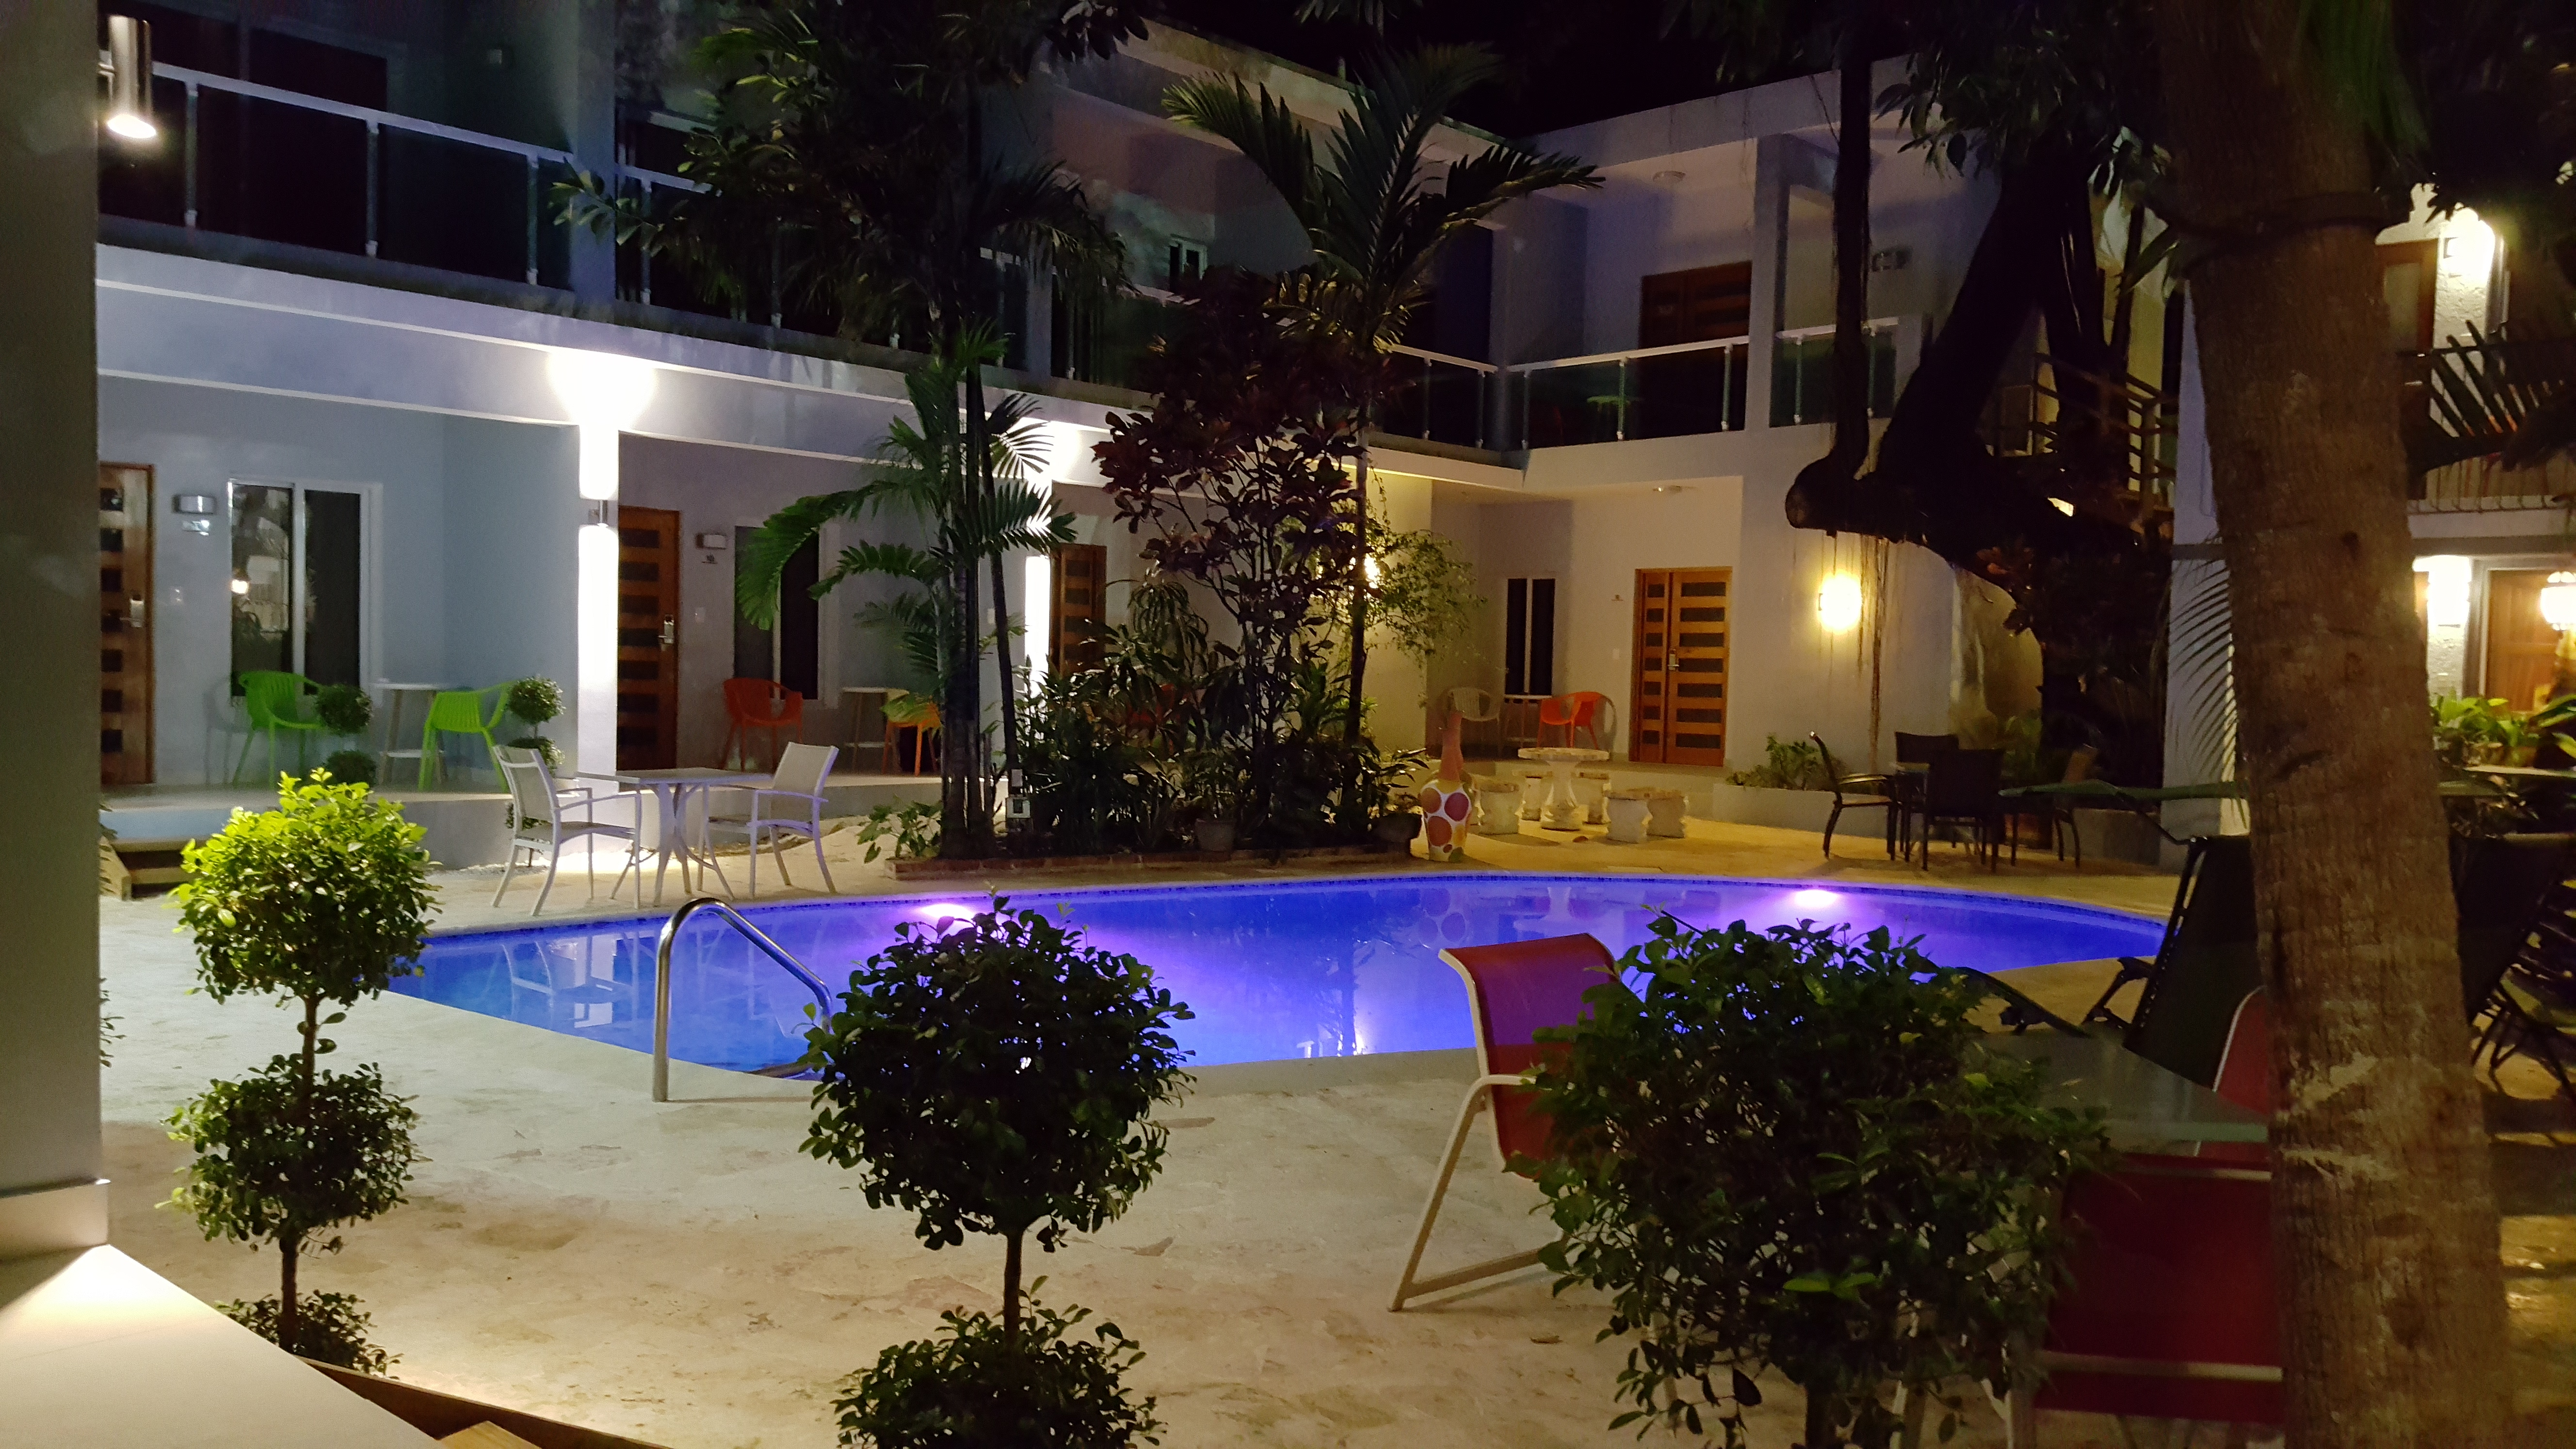 Poolsite @ night